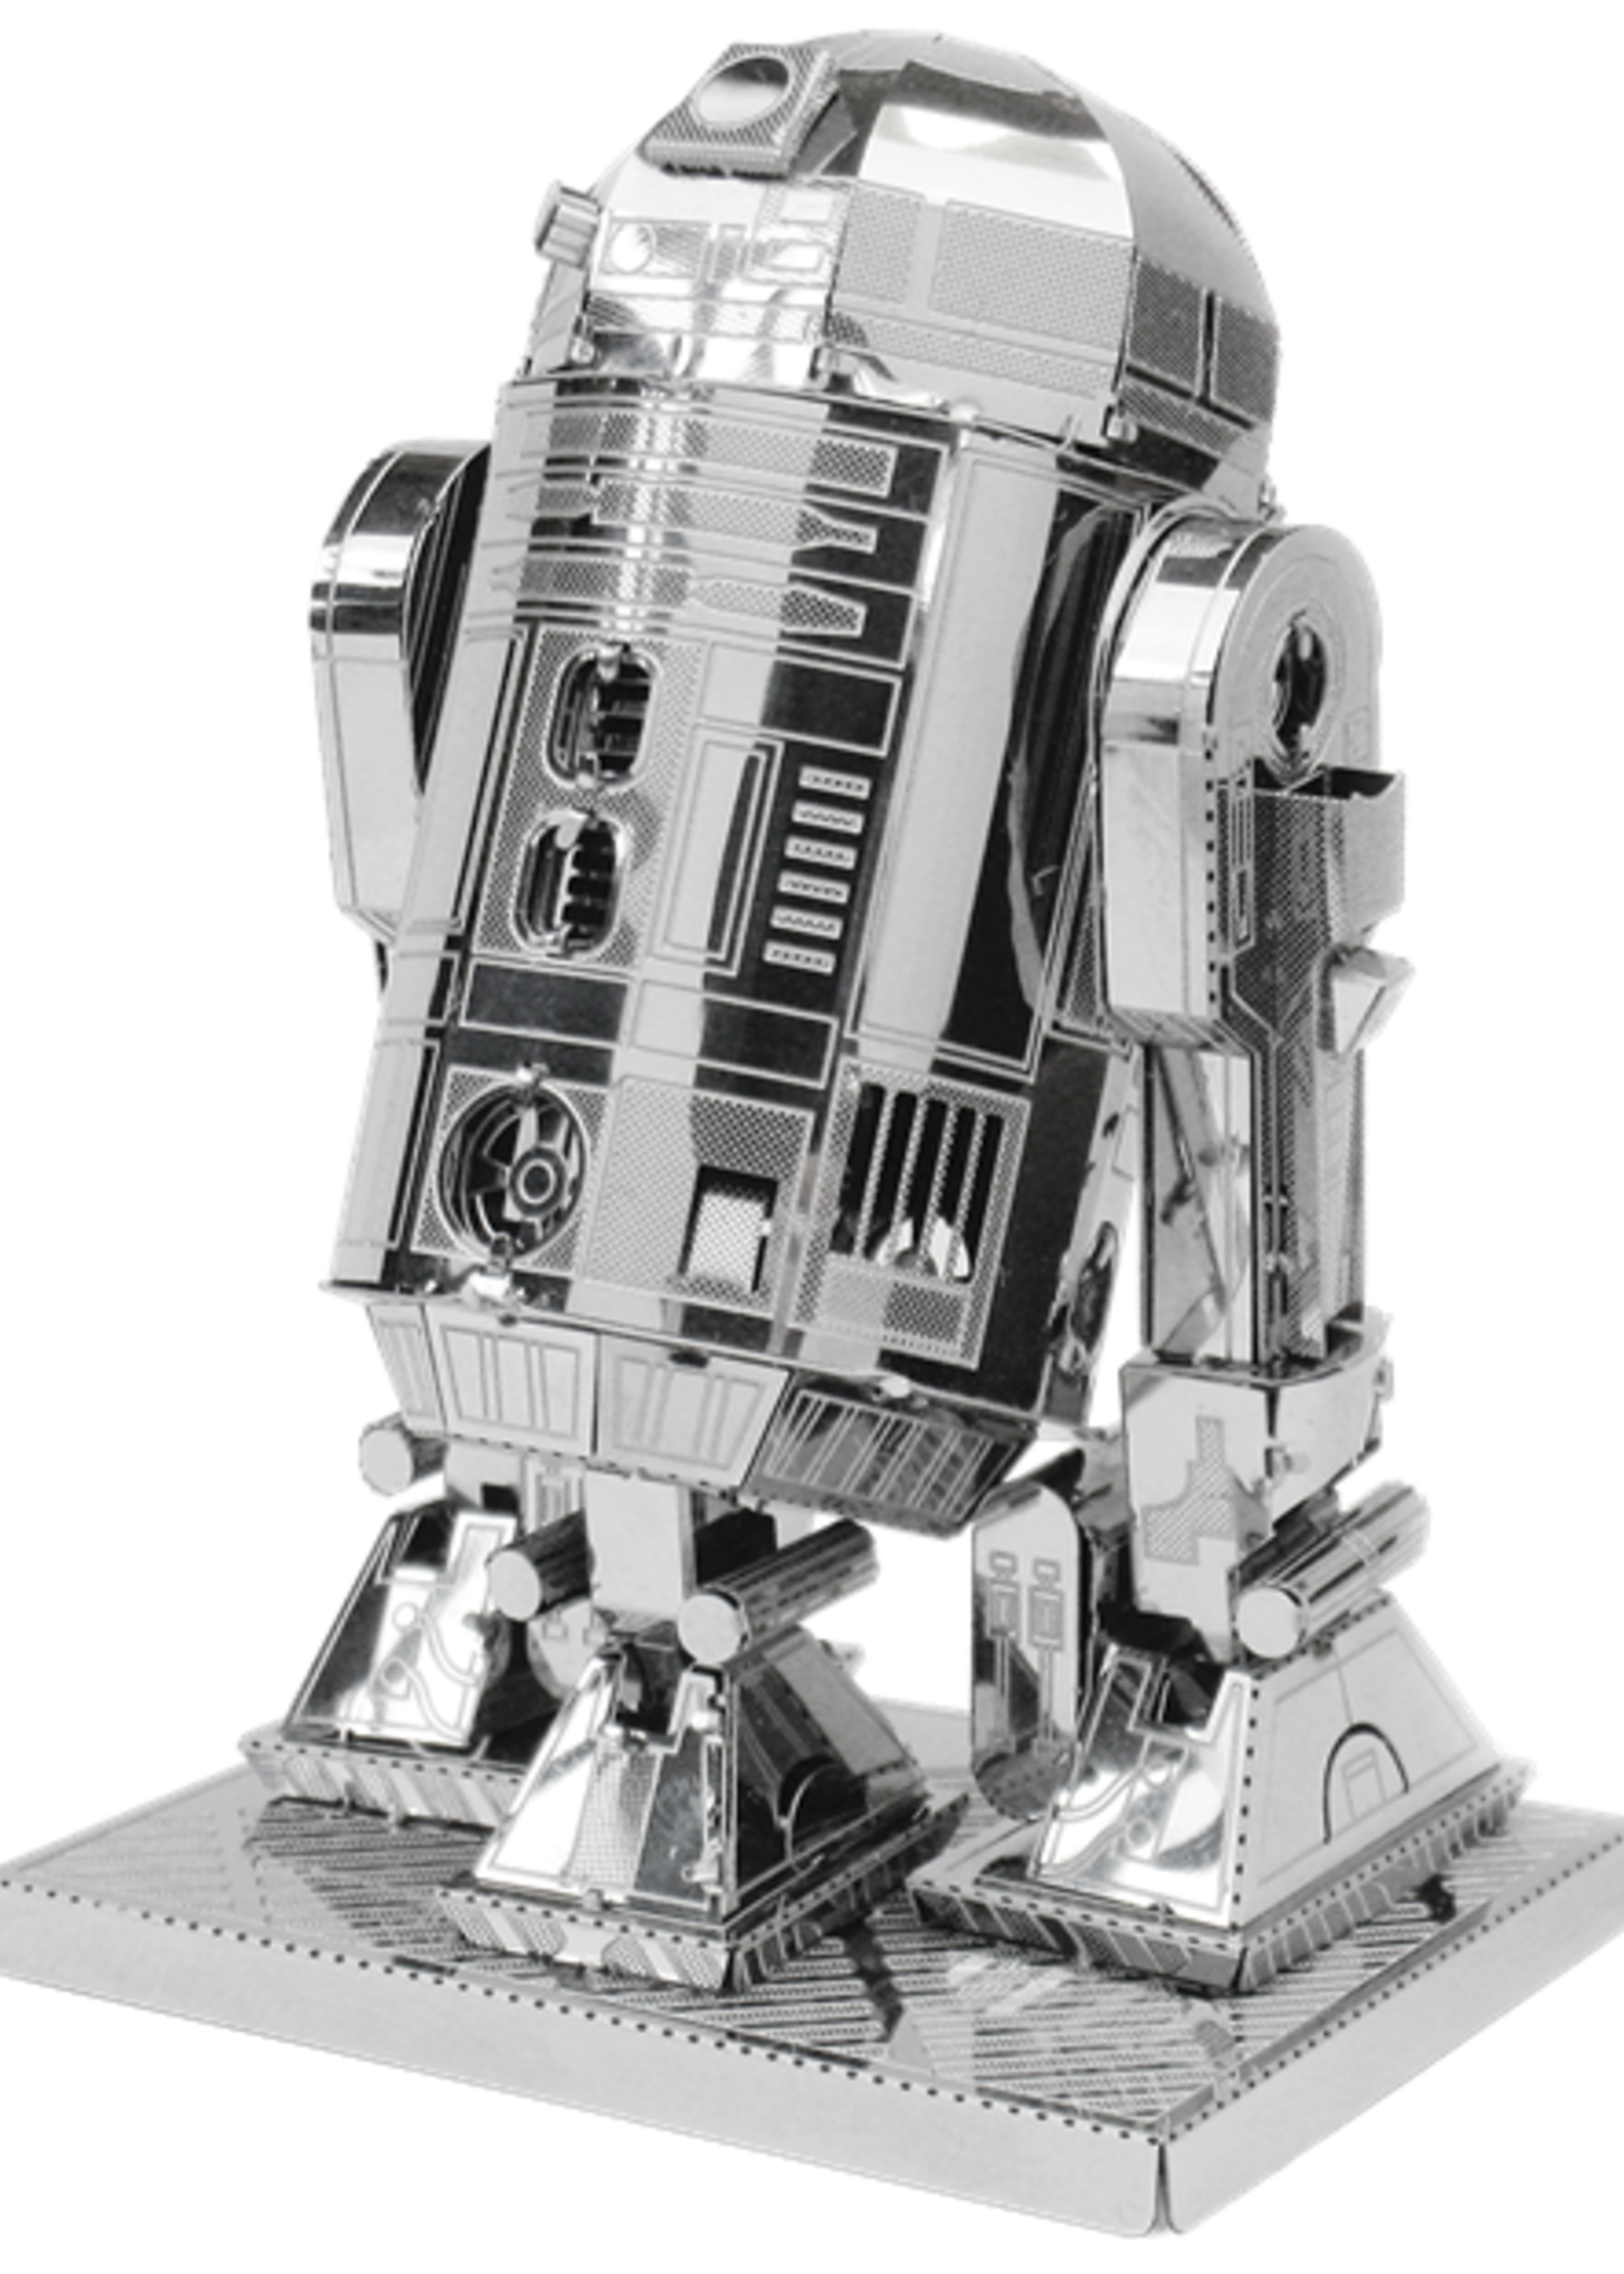 METAL EARTH R2-D2 Star Wars